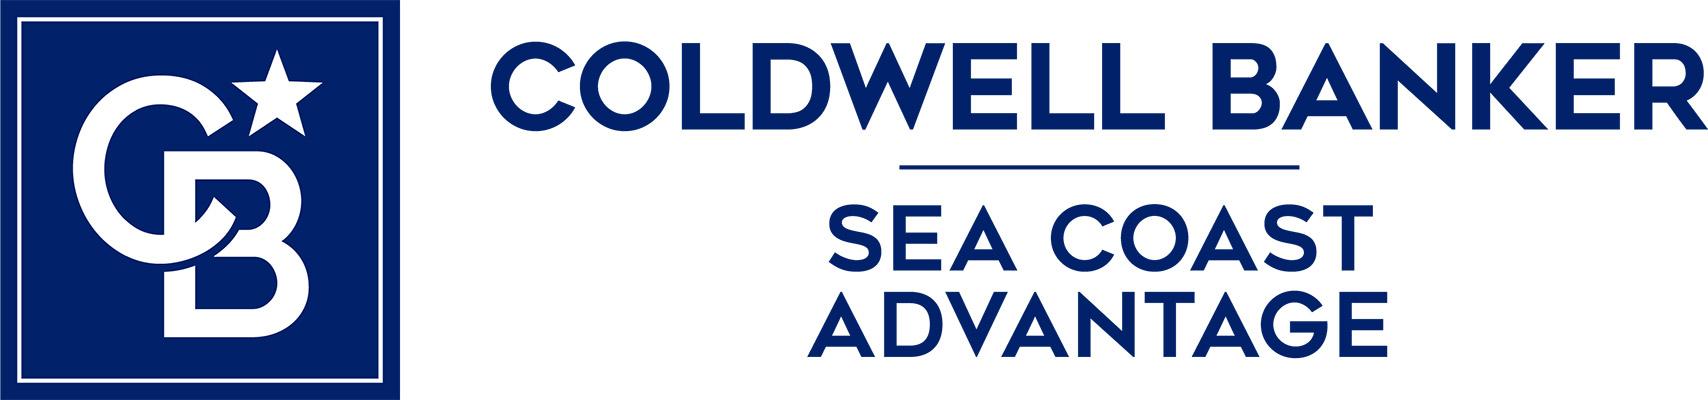 Holly Schreiber - Coldwell Banker Chicora Advantage Logo